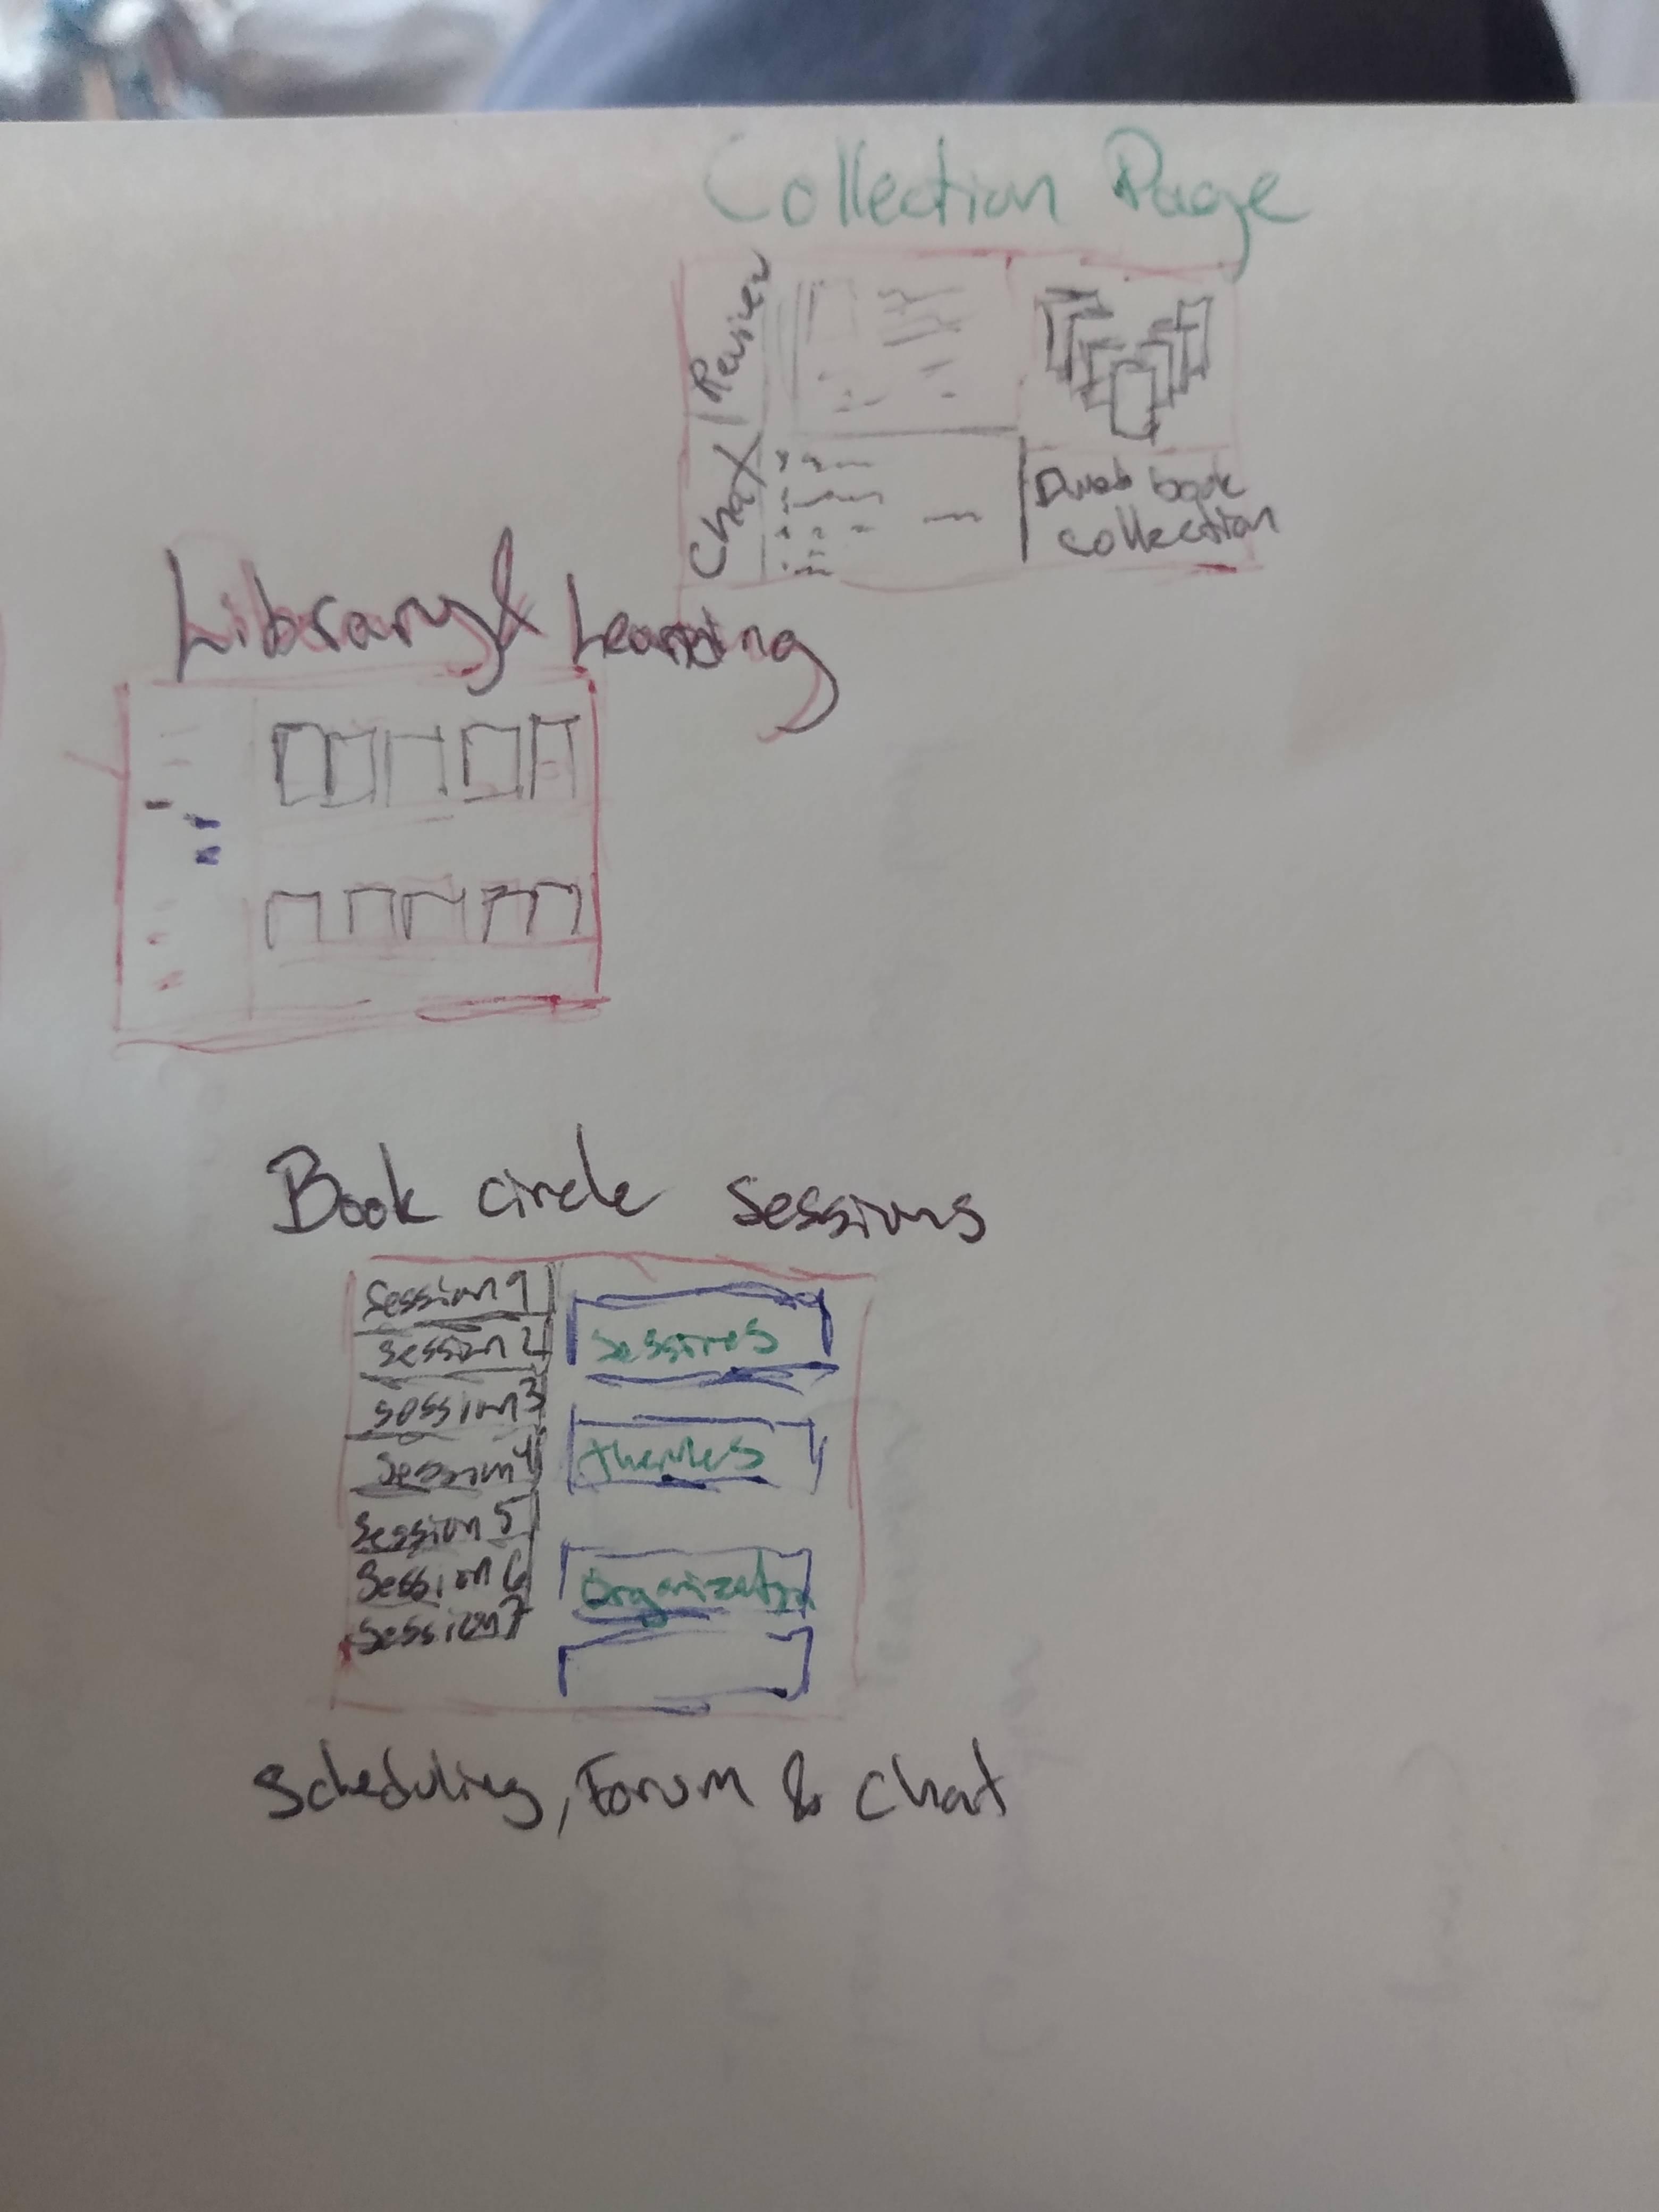 Possible future design considerations